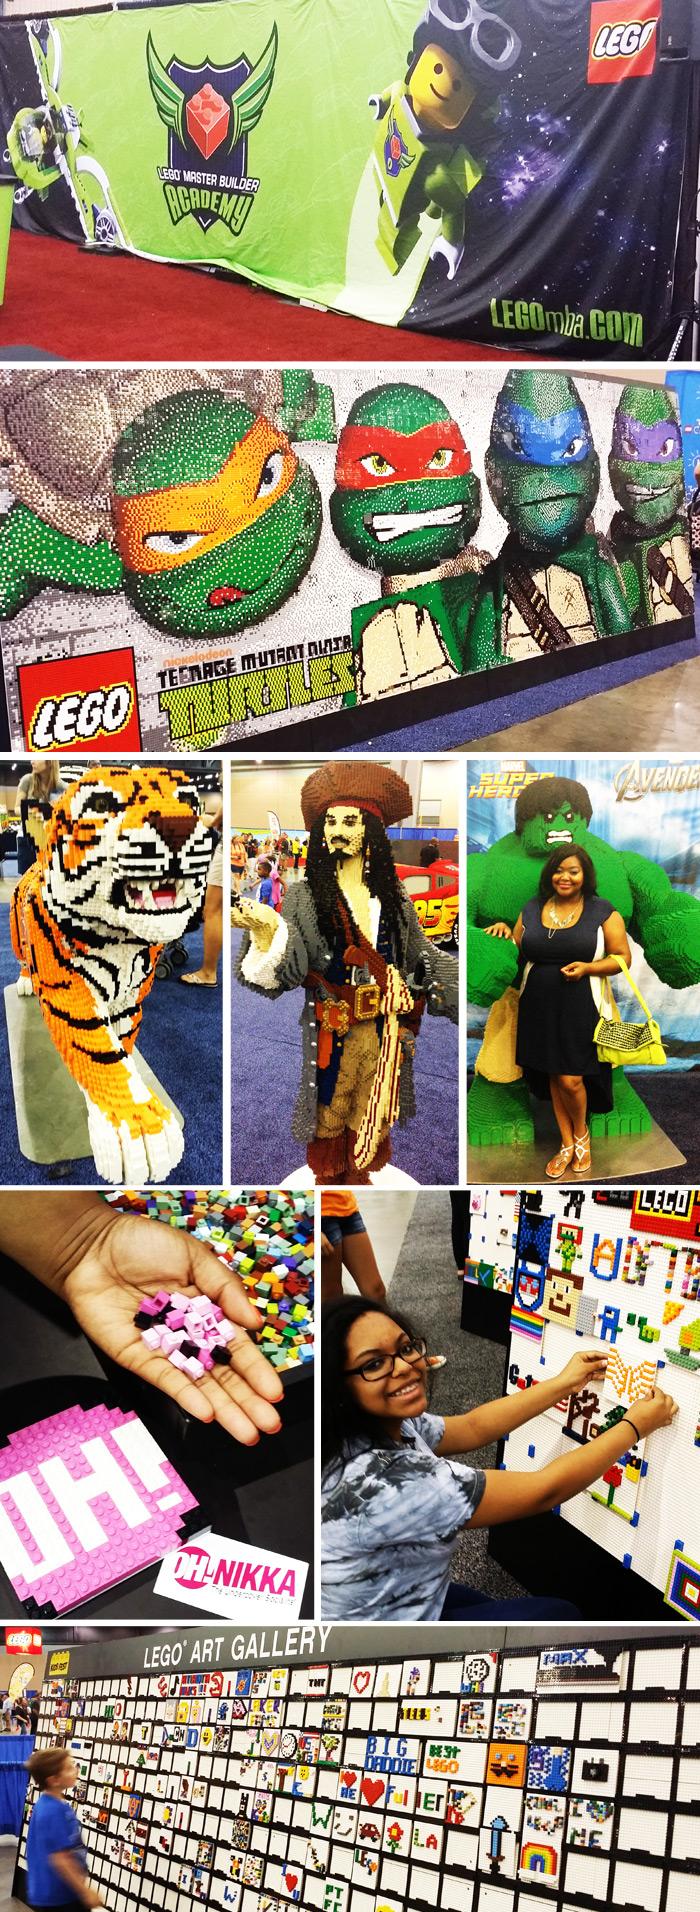 LEGO KidsFest Atlanta